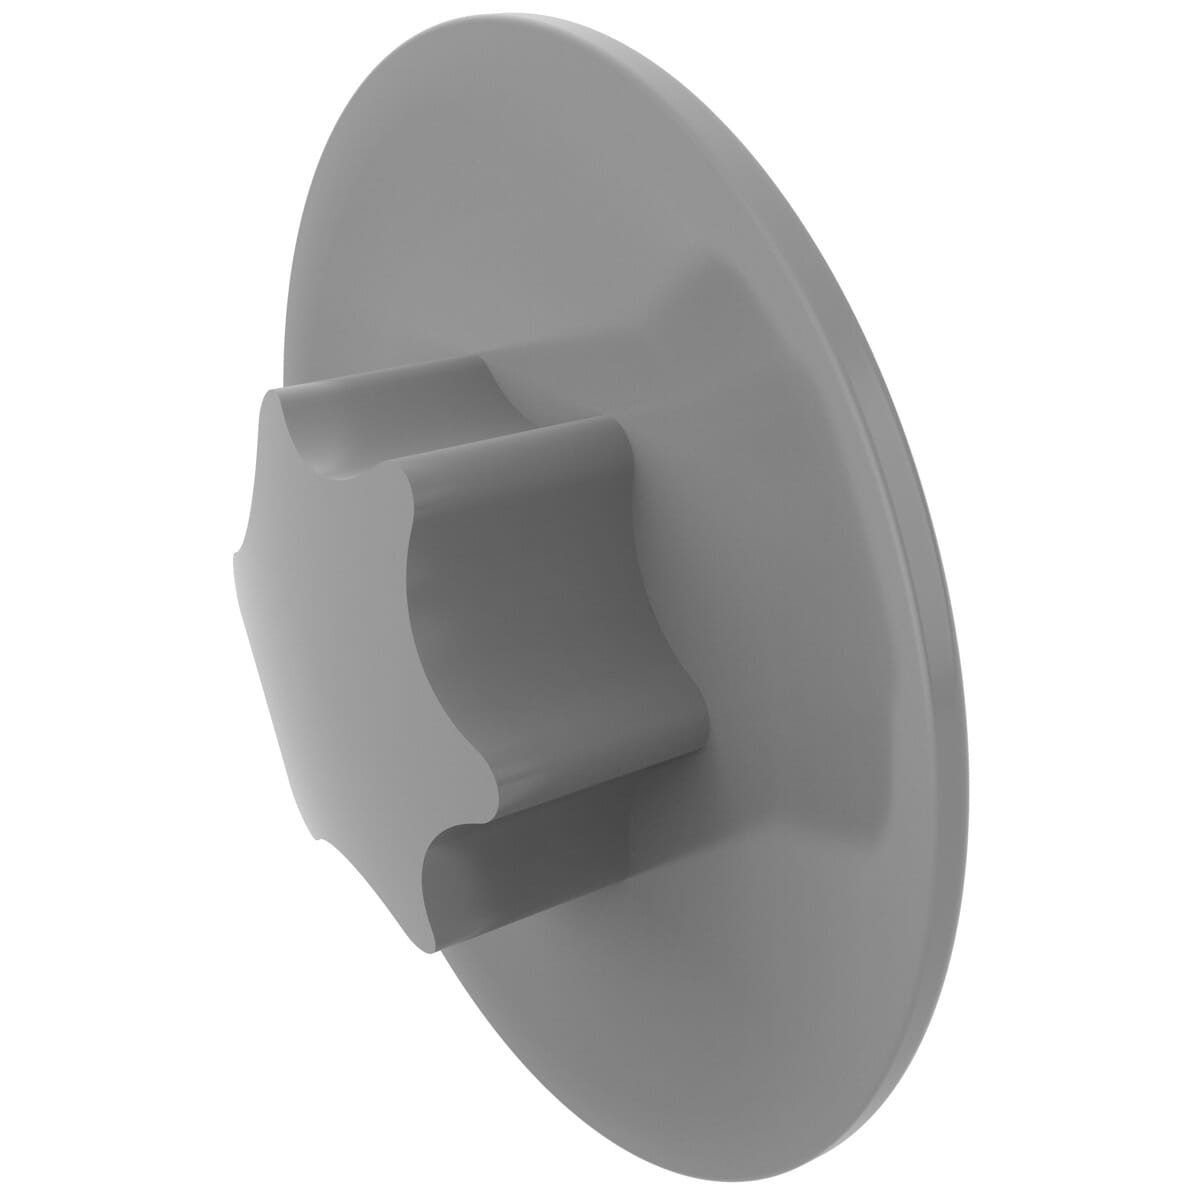 30 x 16.2mm Torx Screw Caps - Grey LDPE